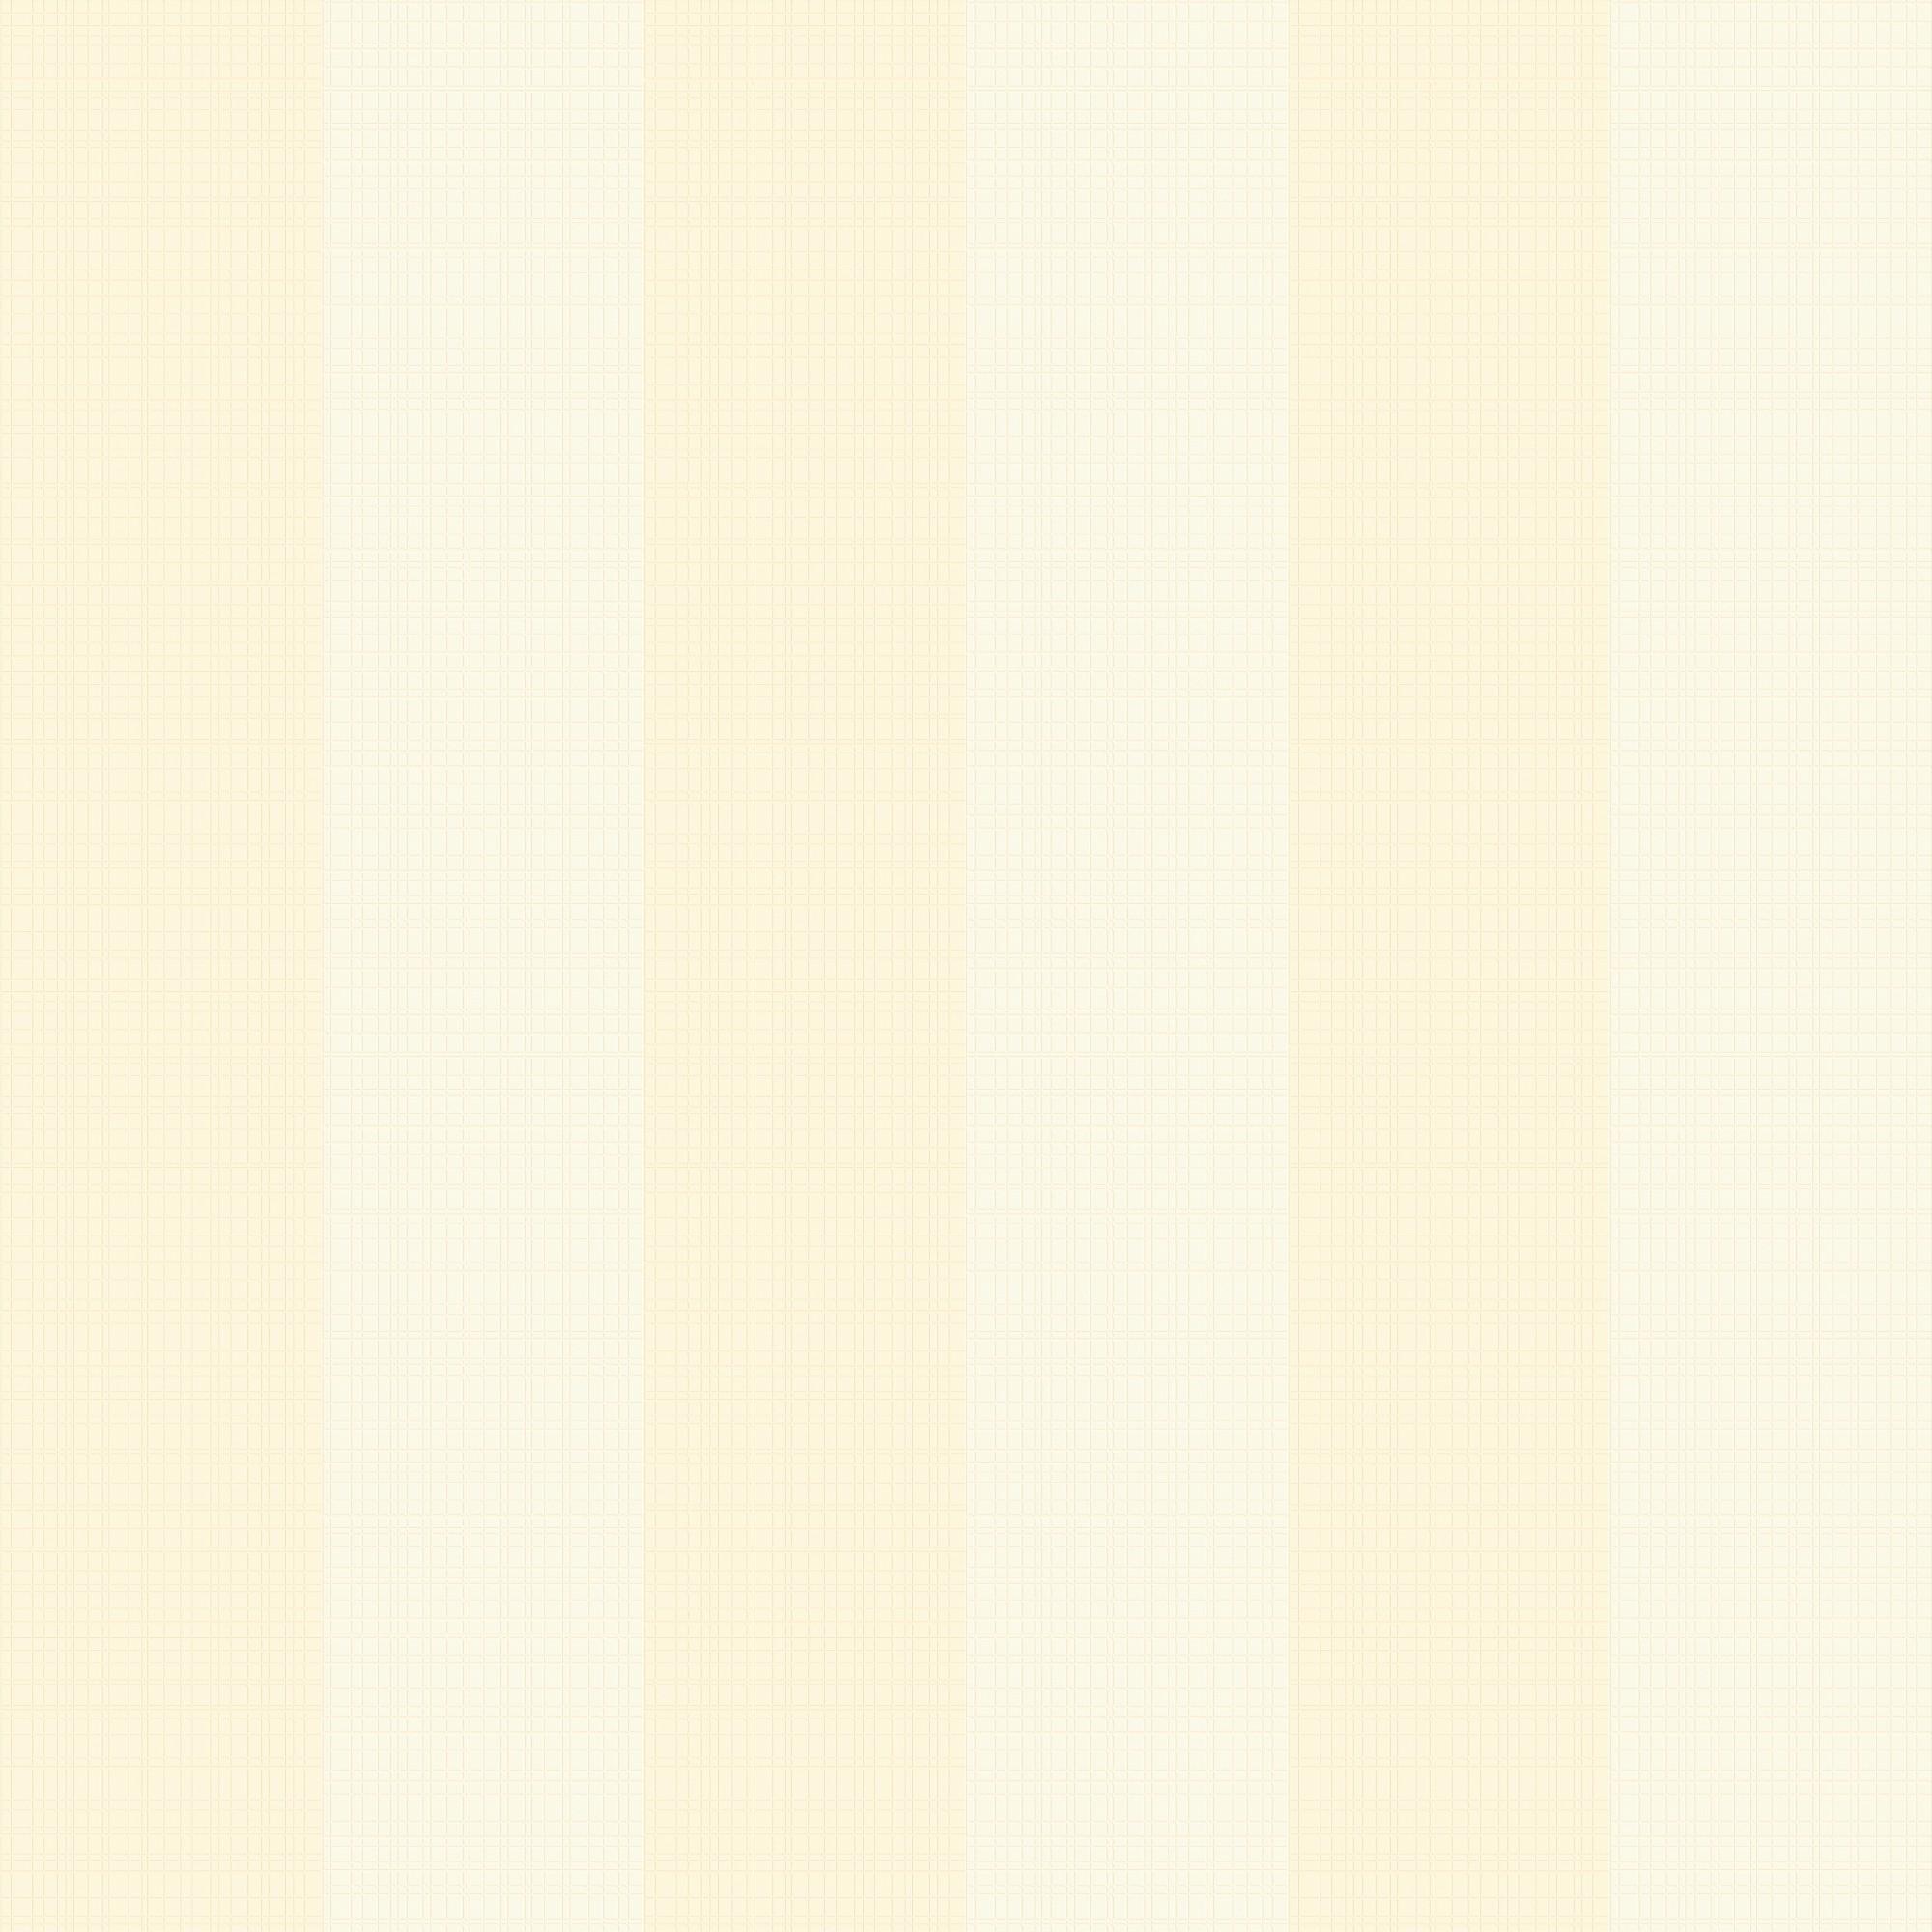 Papel de Parede 53cm x 10m PVC Texturizado Meranti 1661 - Jolie